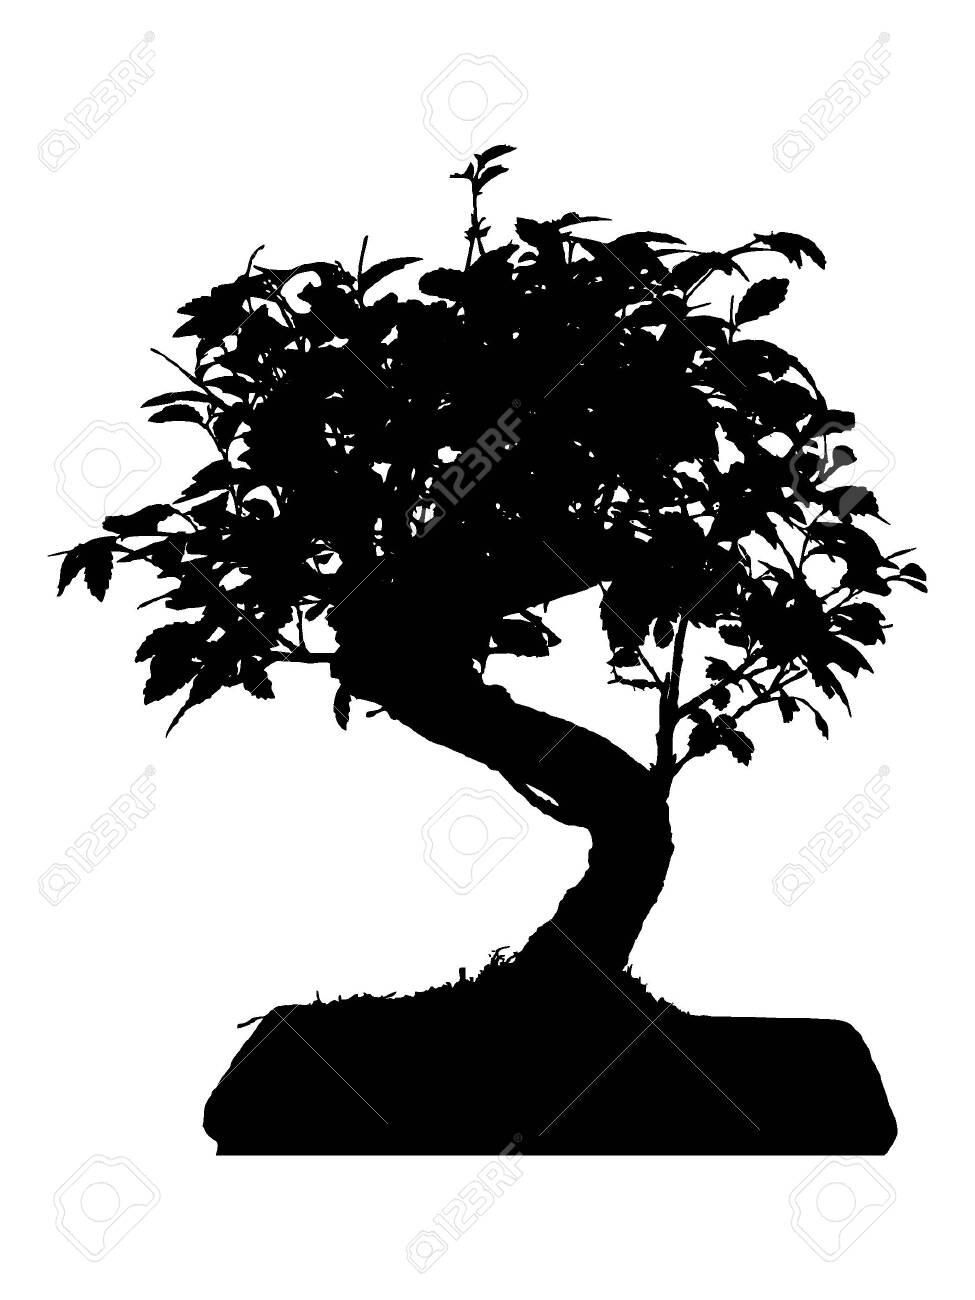 Bonsai Silhouette : bonsai, silhouette, Black, White, Silhouette, Traditional, Japanese, Bonsai, Tree.., Royalty, Cliparts,, Vectors,, Stock, Illustration., Image, 134977860.